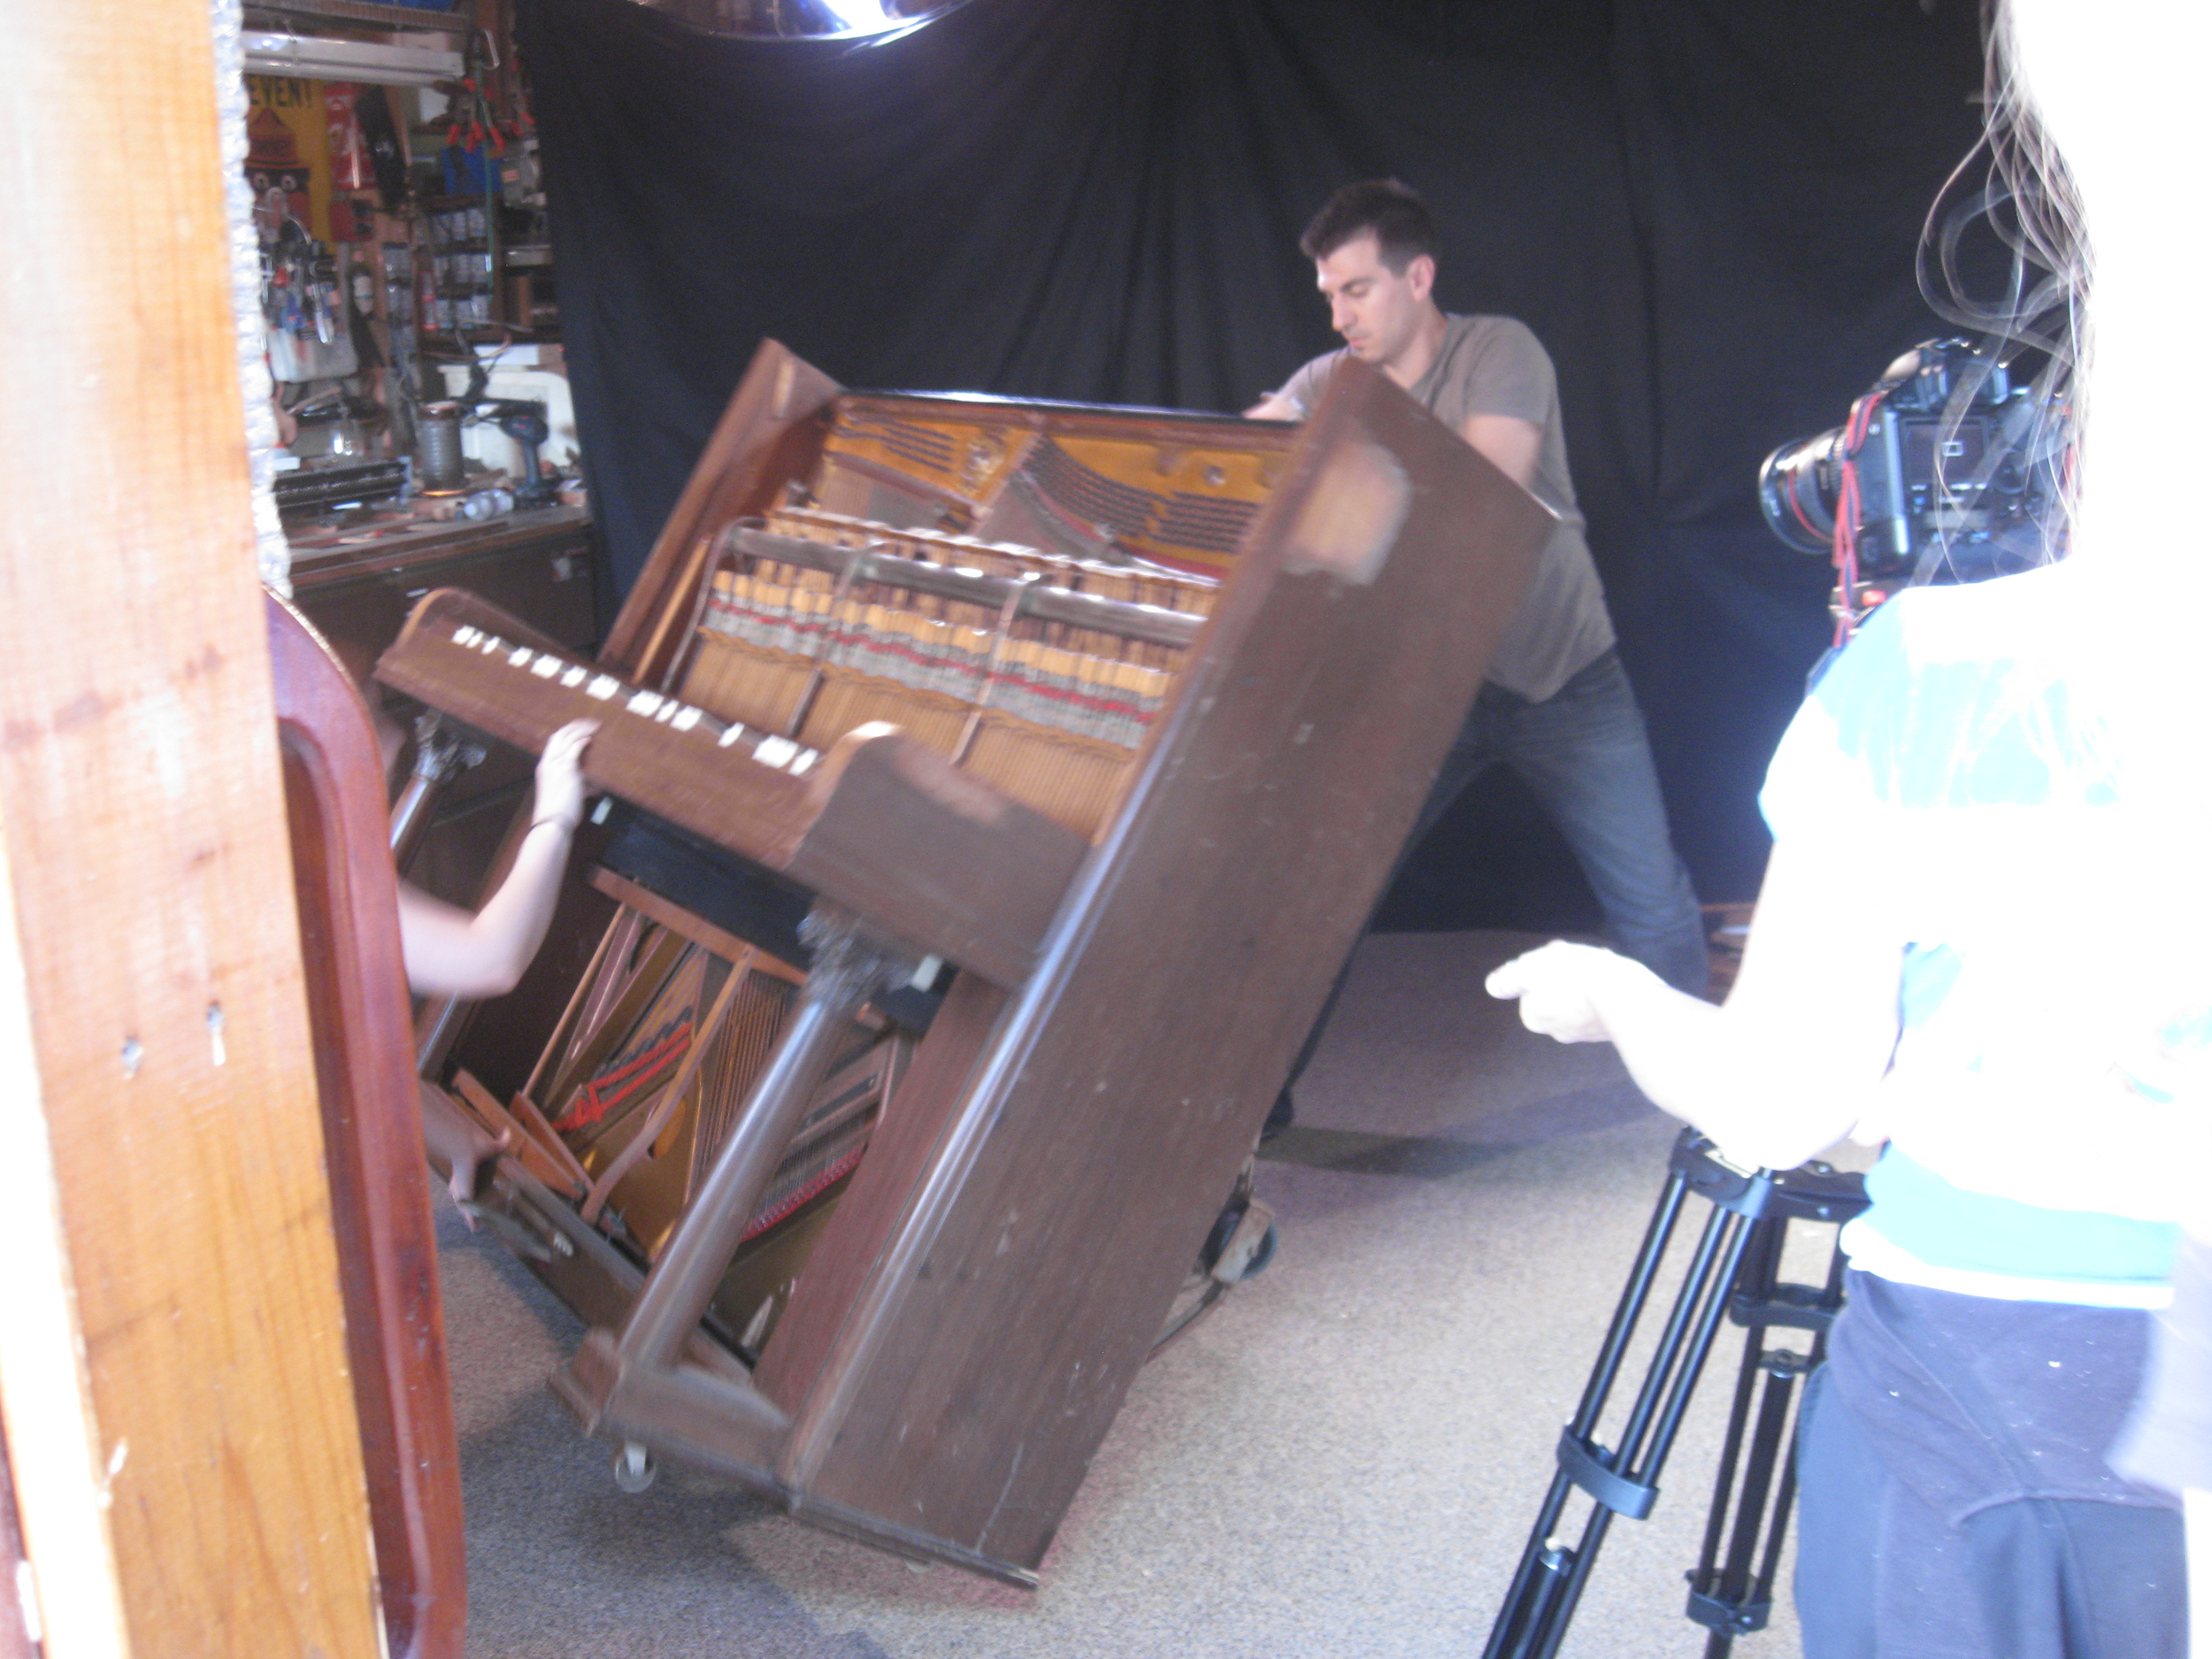 tina-guo-paul-spaeth-redemption-piano-cello-37.JPG